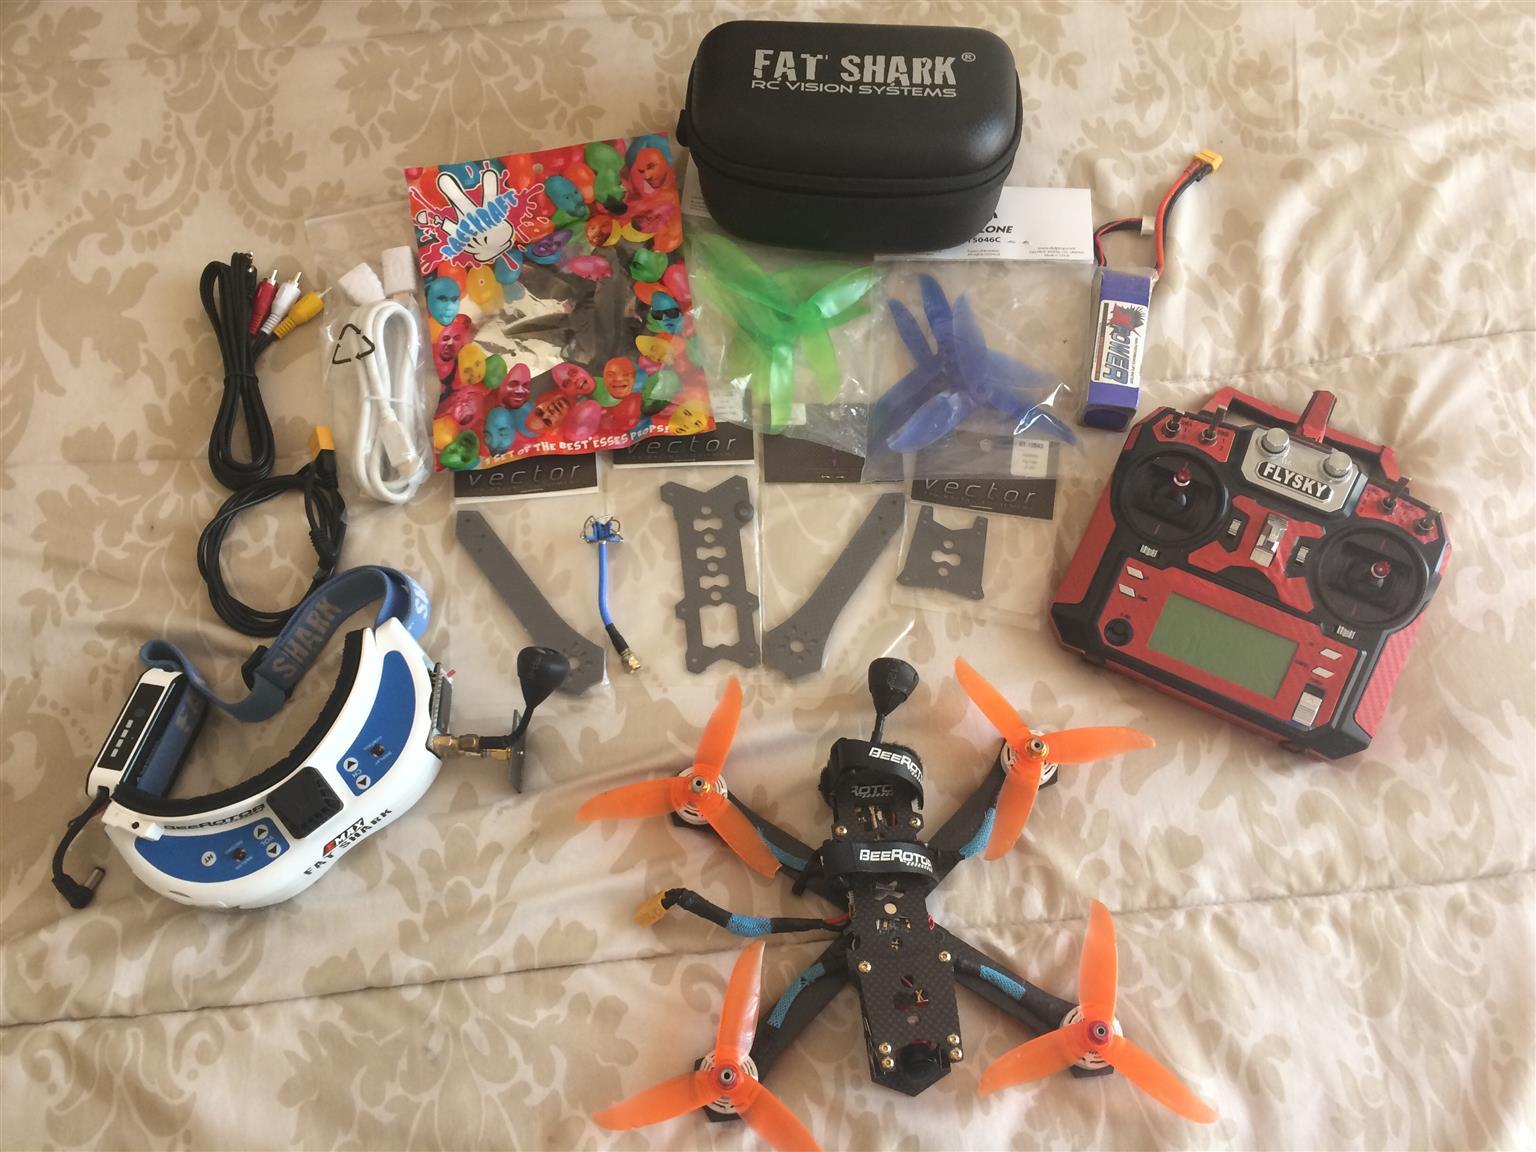 RTF Racing Drone Set